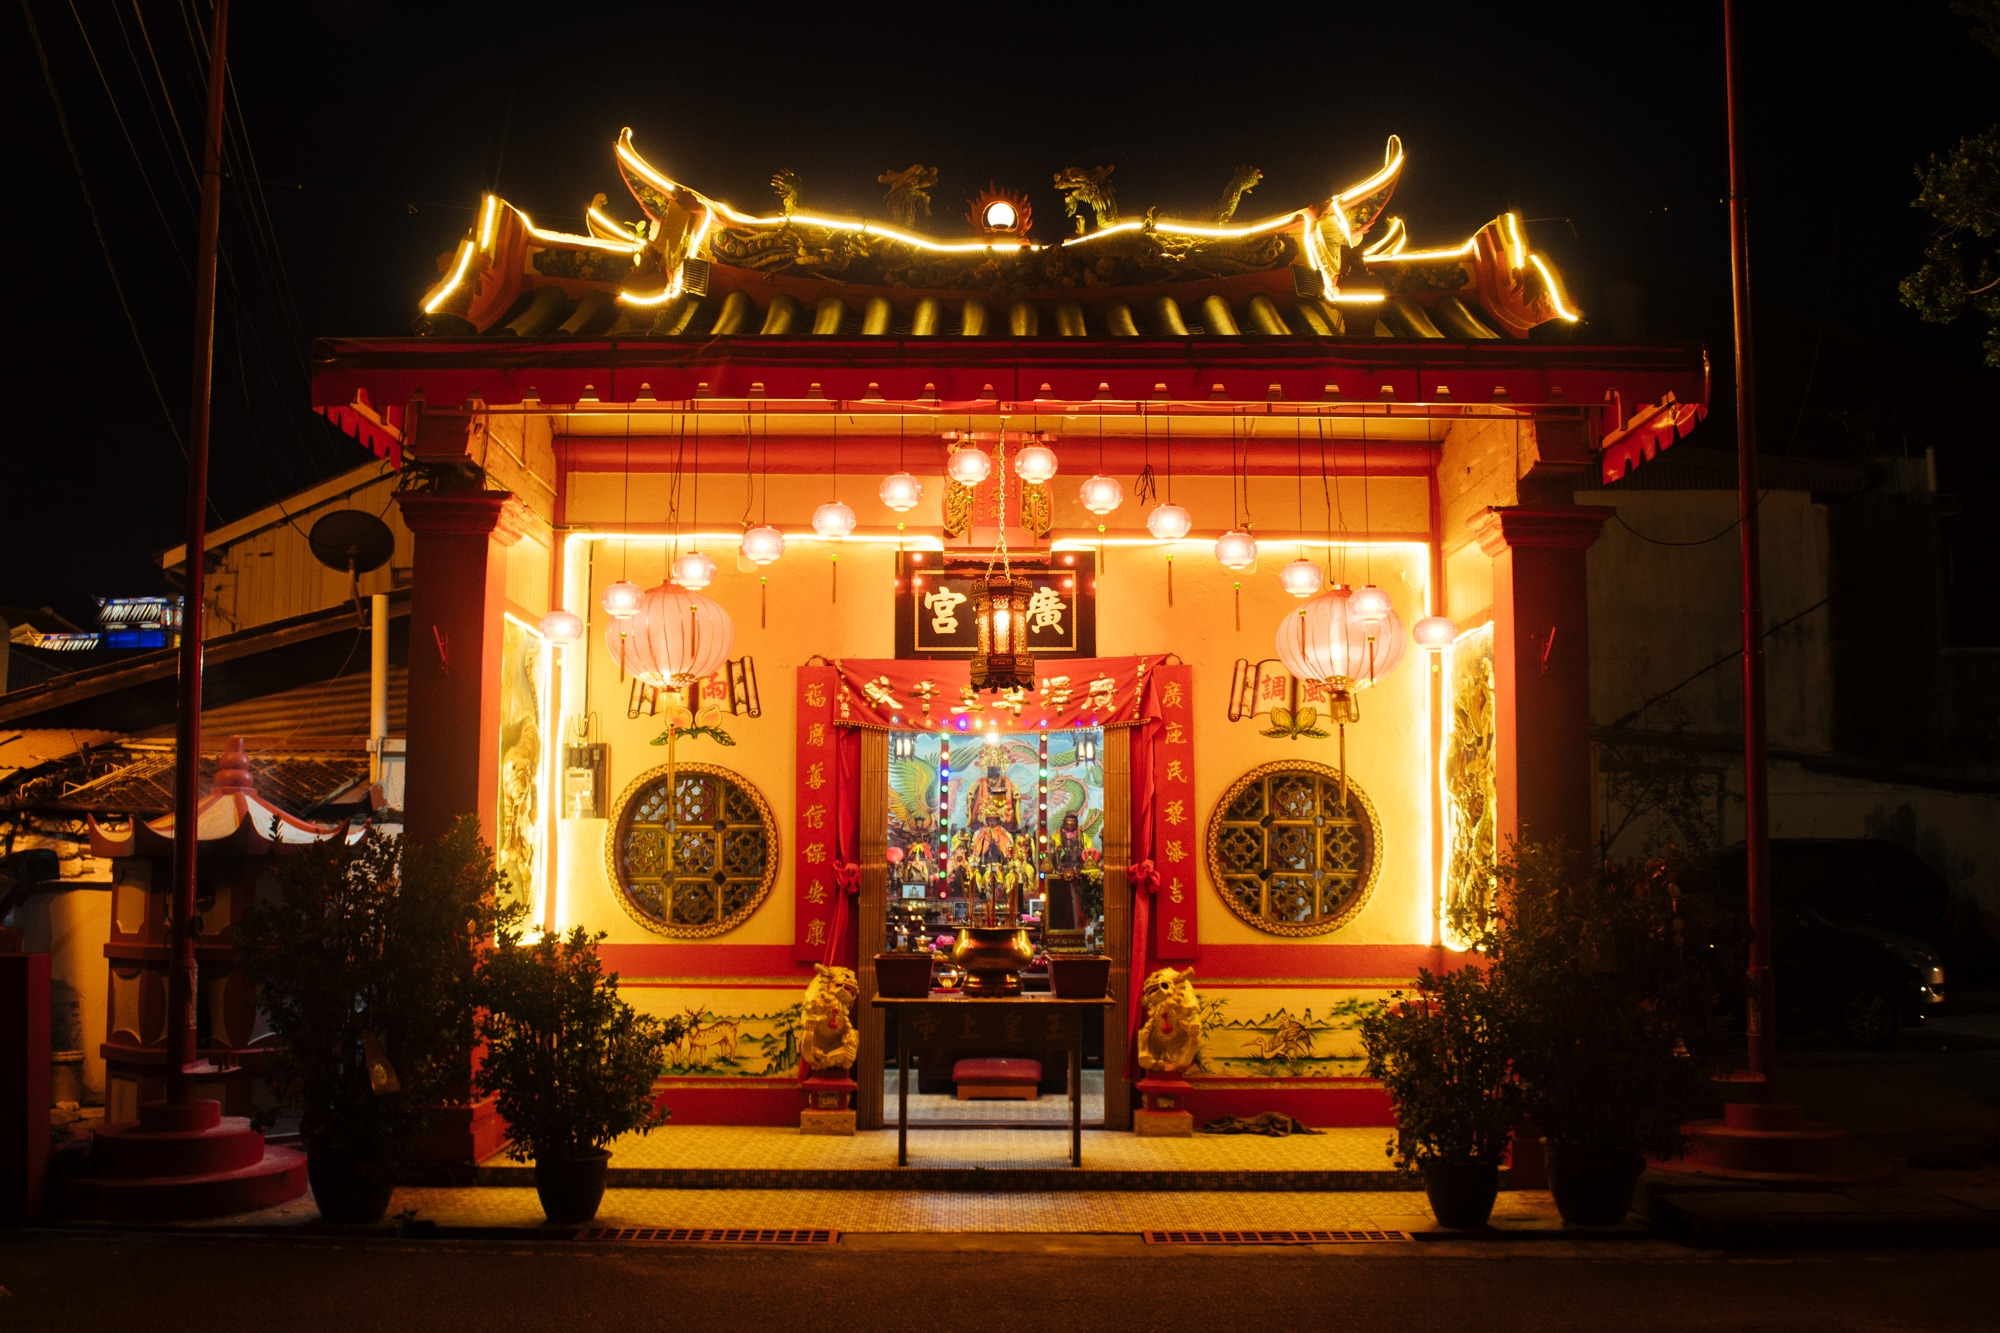 A Buddhist temple in Malaka, Malaysia